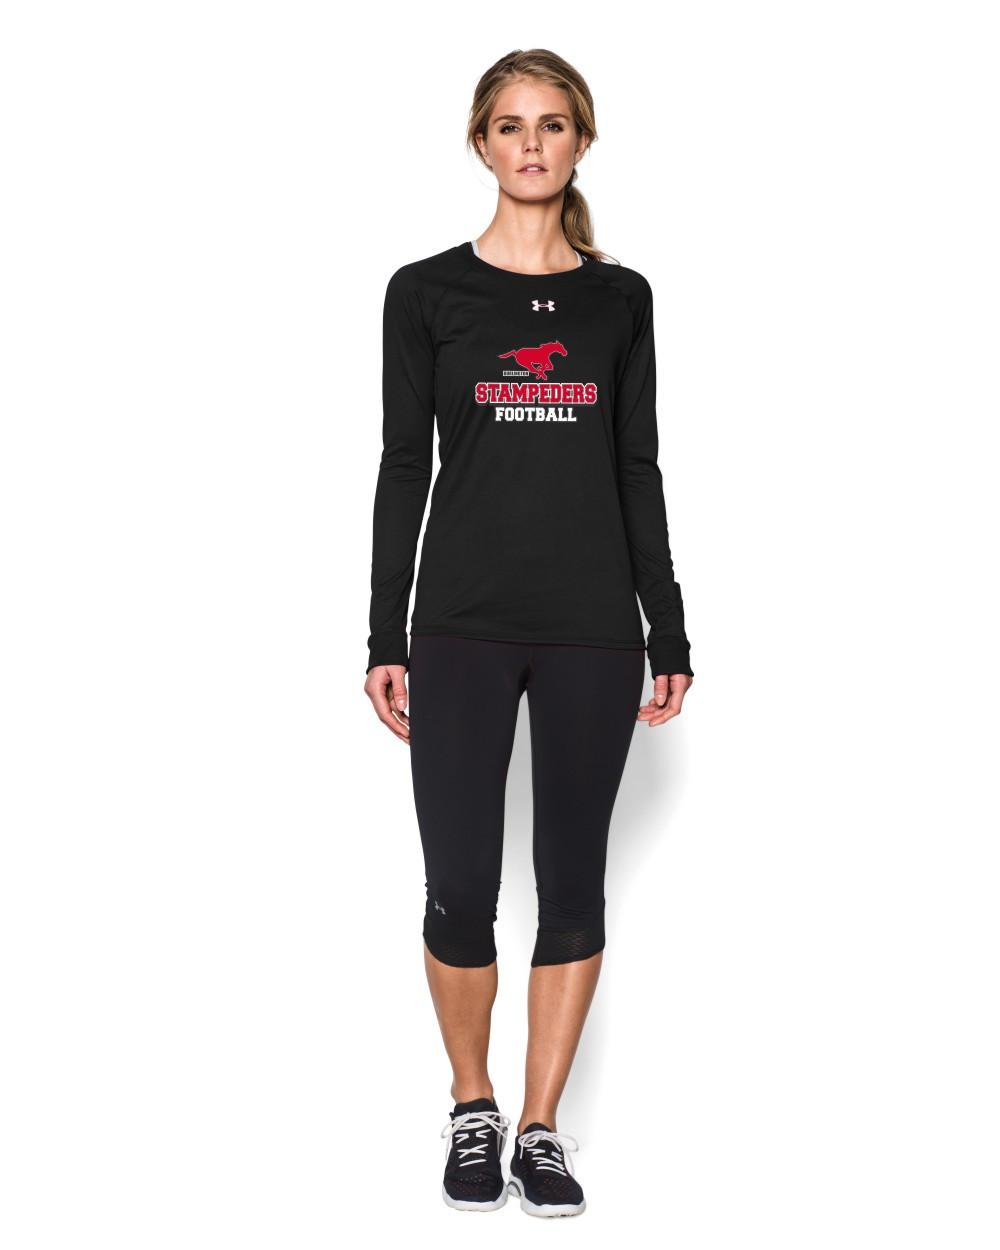 76dbc1f5ef91 BMFA Under Armour Women s Long Sleeves Locker T-Shirt - Black ...